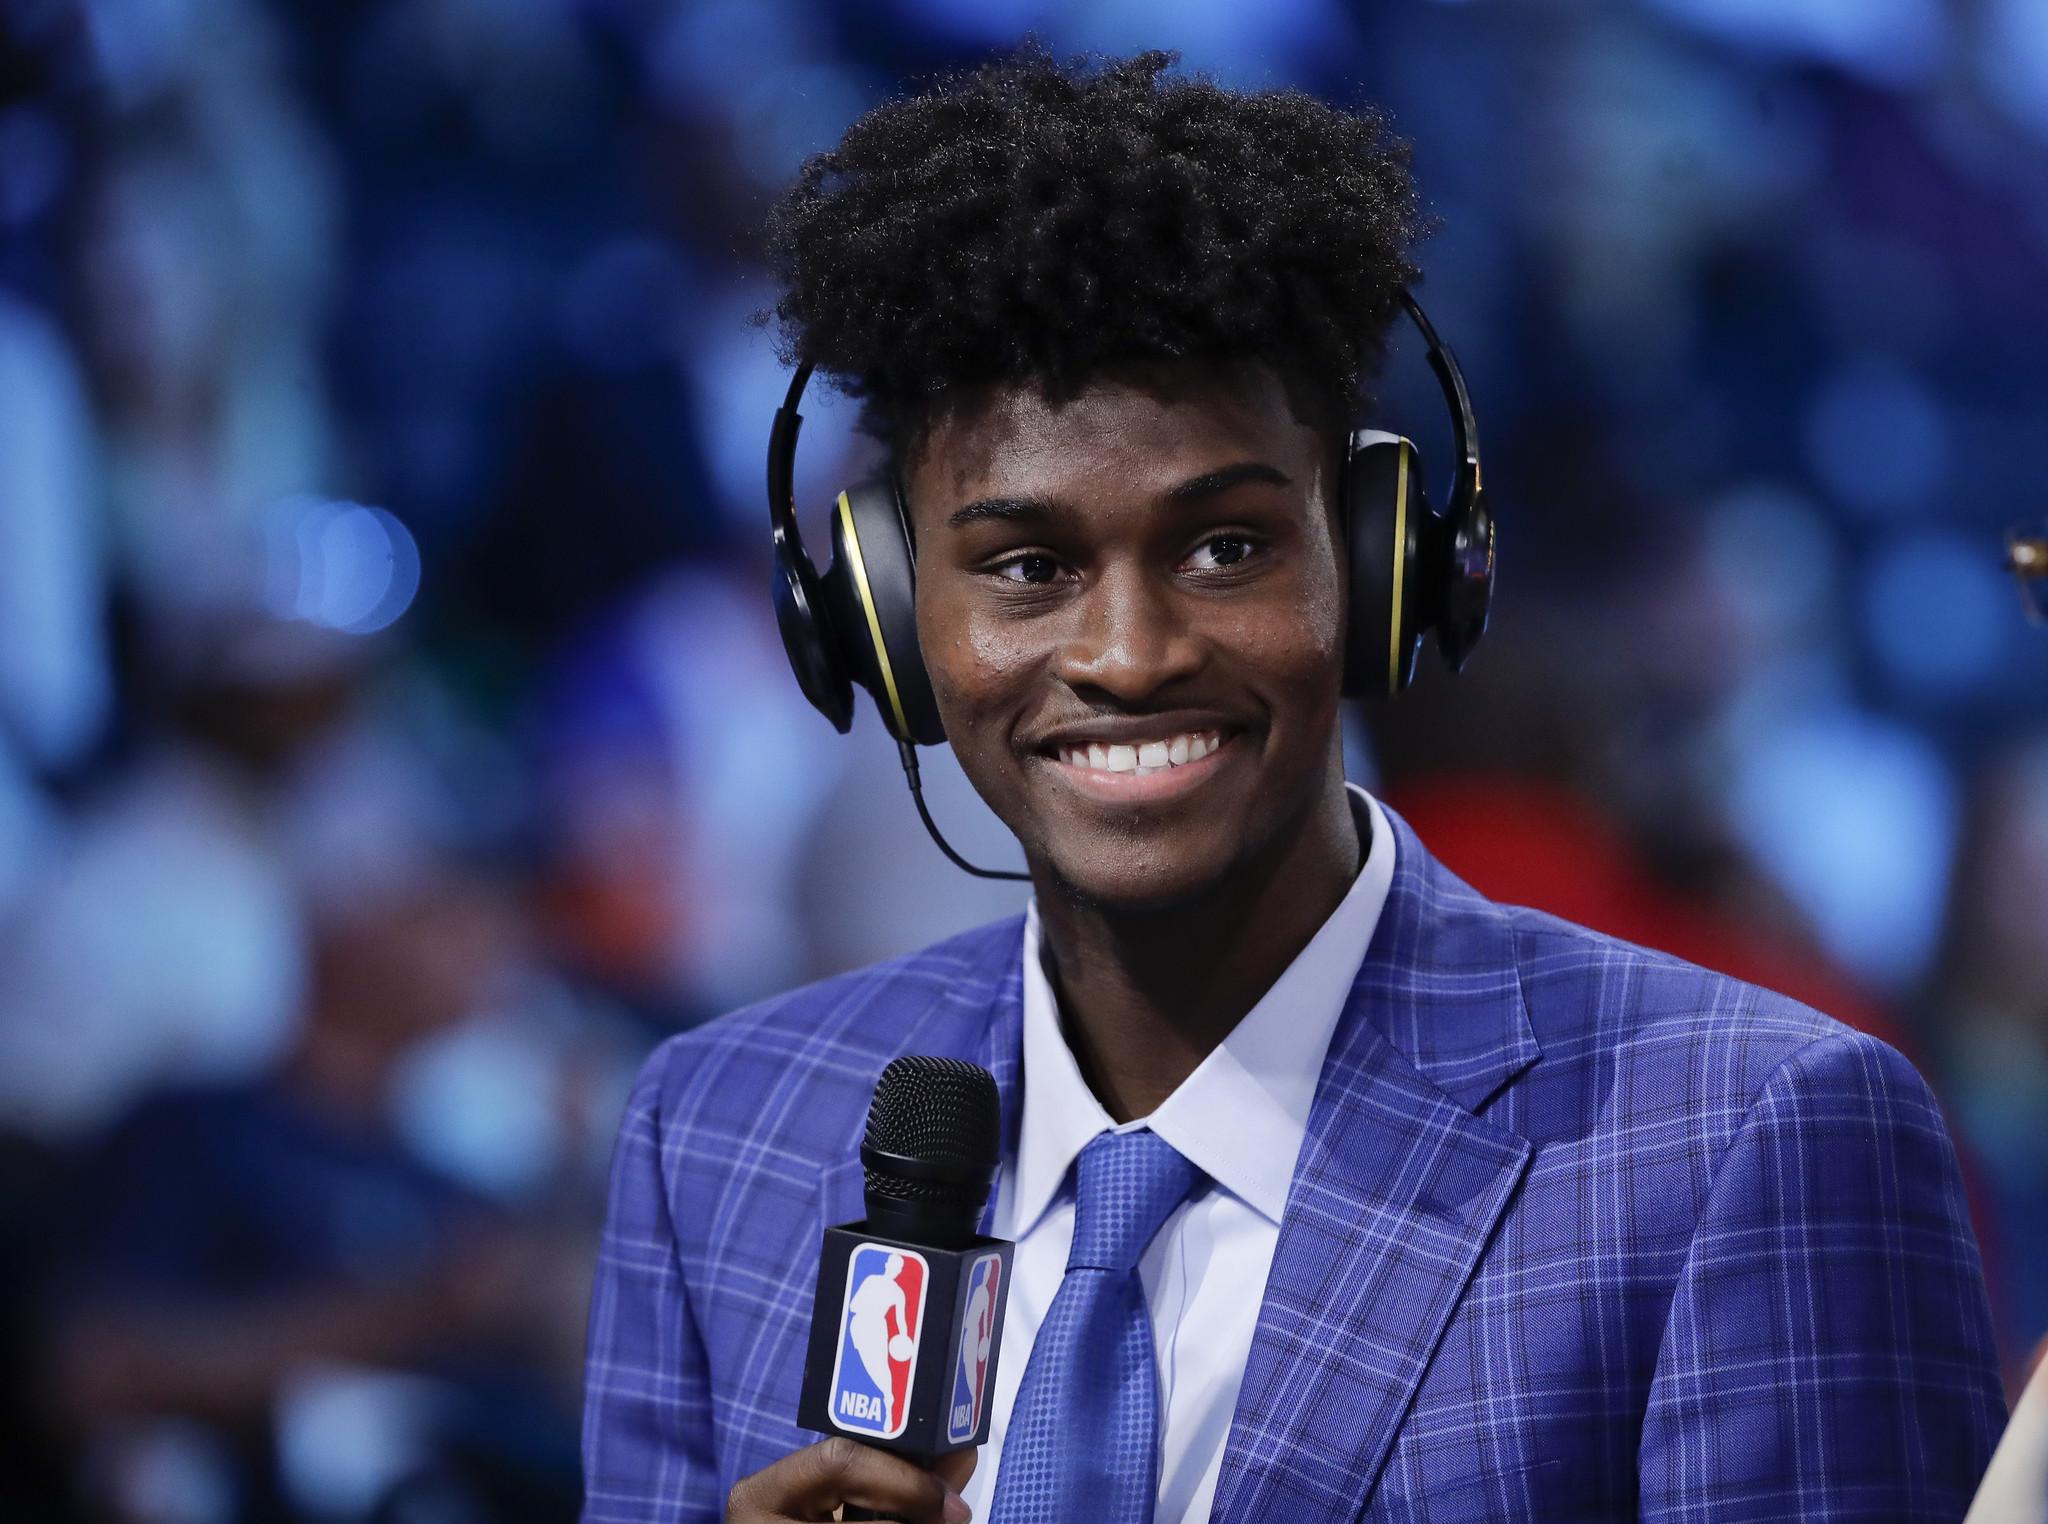 Pictures Orlando Magic Draft Pick Jonathan Isaac